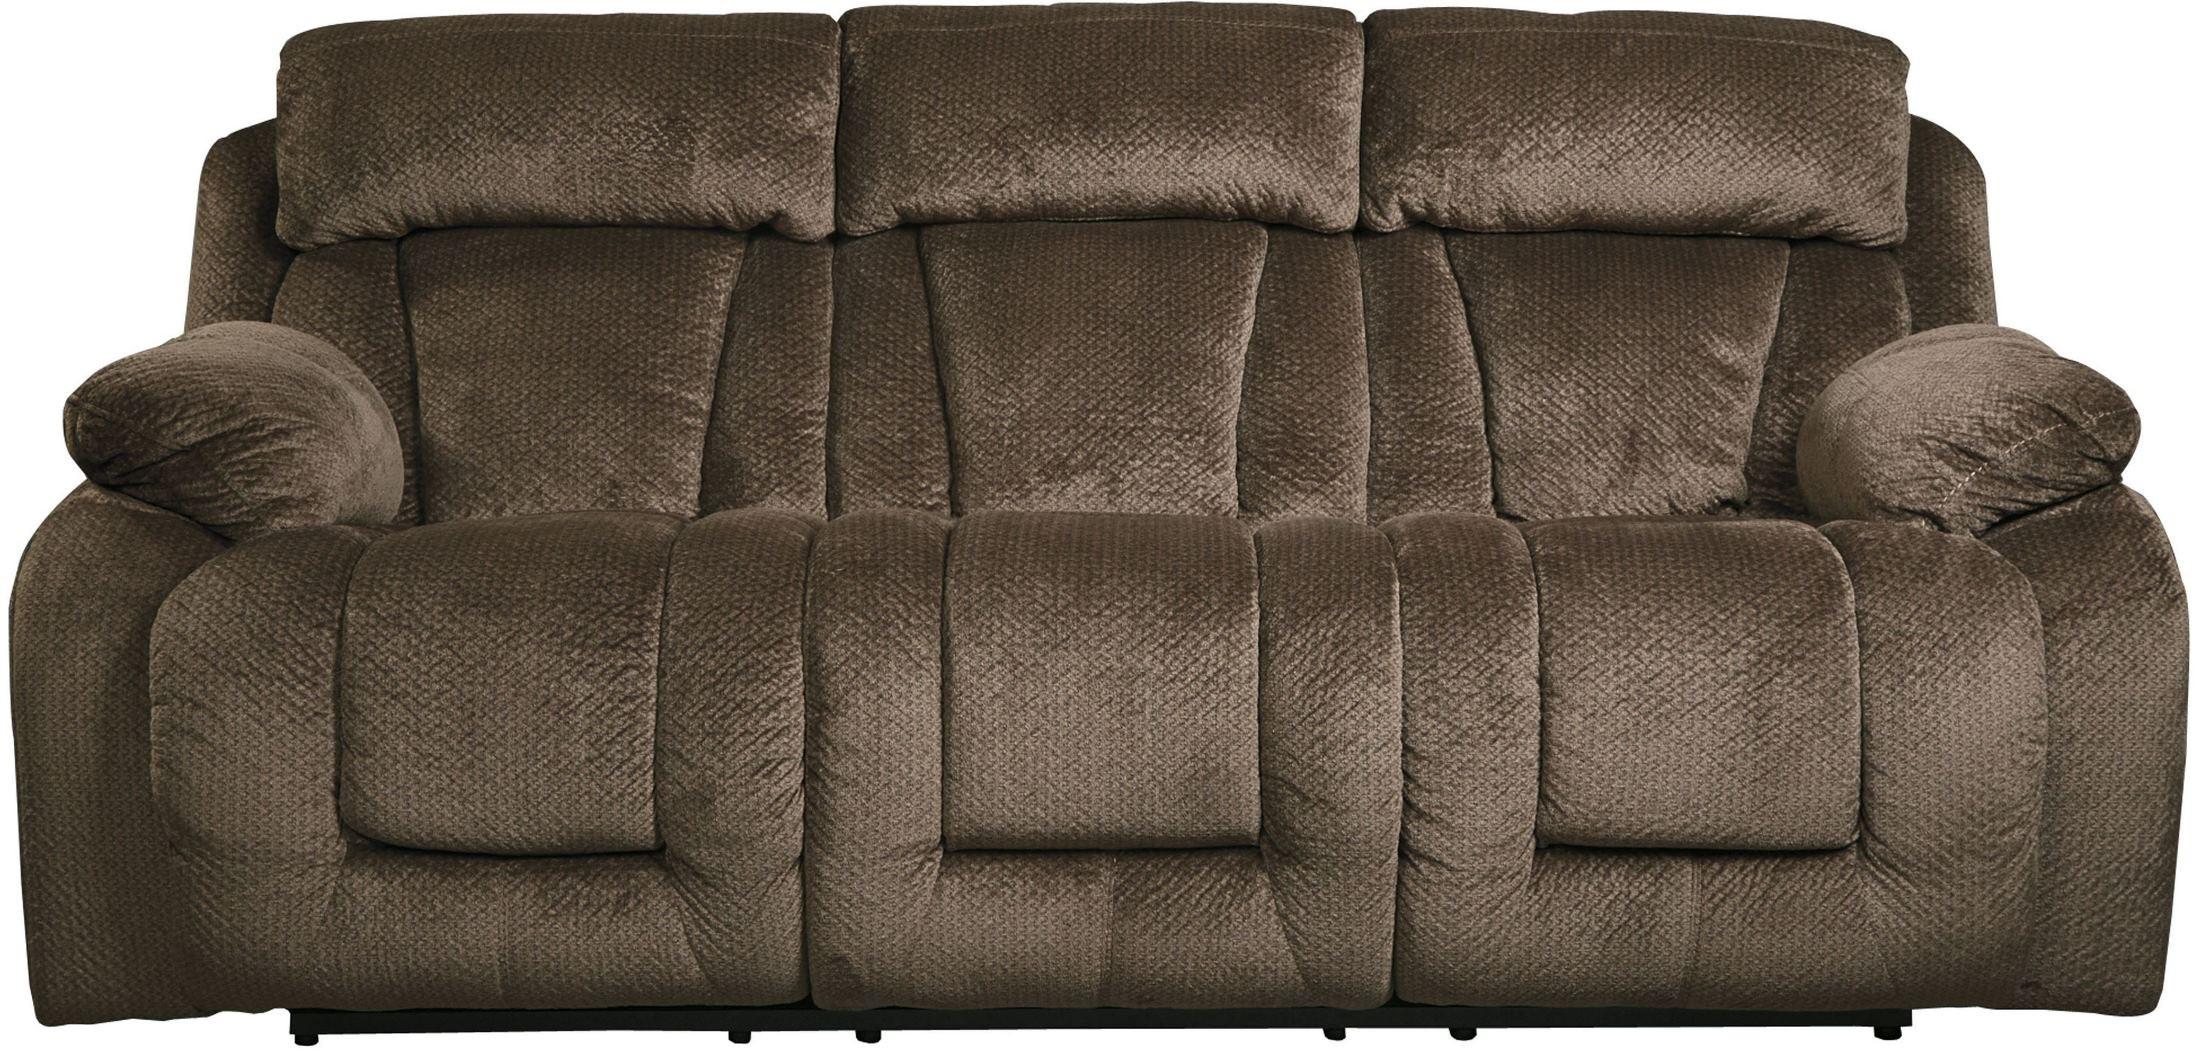 Stricklin Brown Reclining Sofa From Ashley 8650388